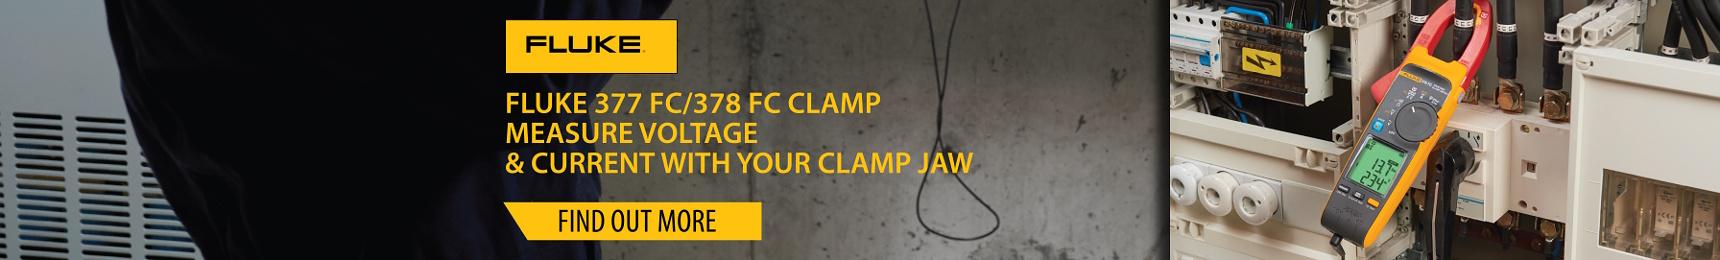 Fluke Power Quality Clamp 378 FC